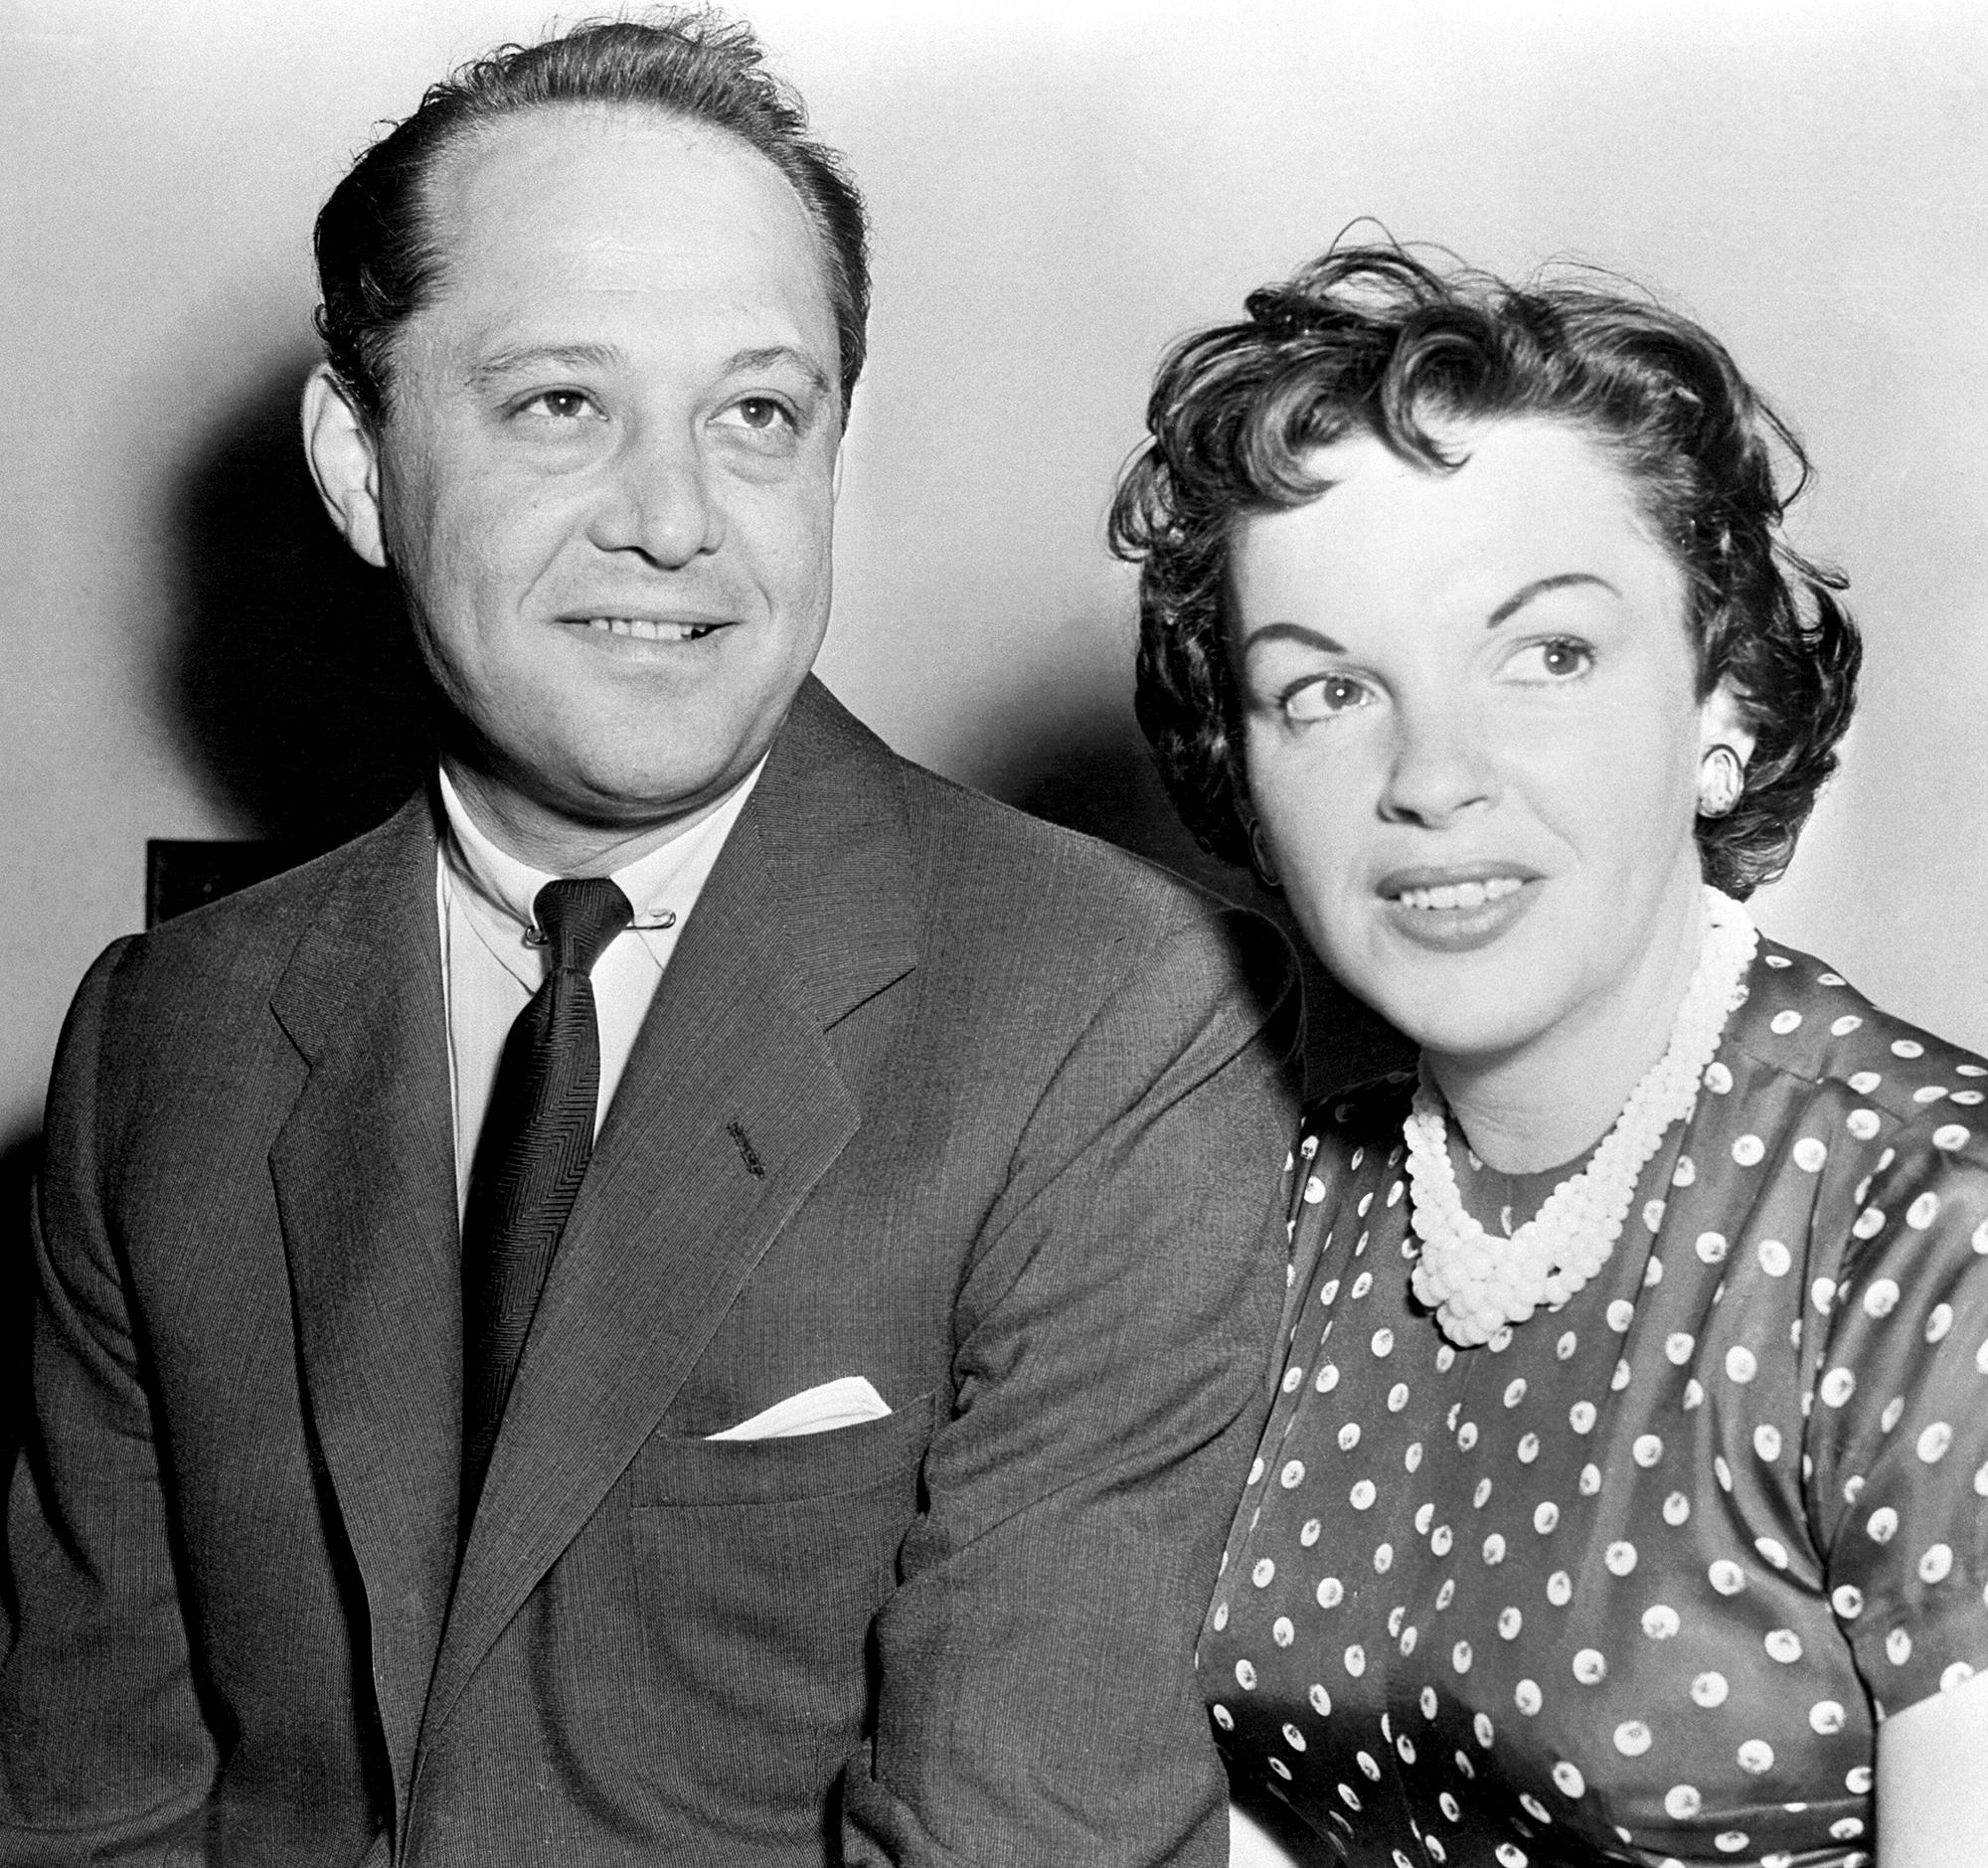 Sid Luft and Judy Garland